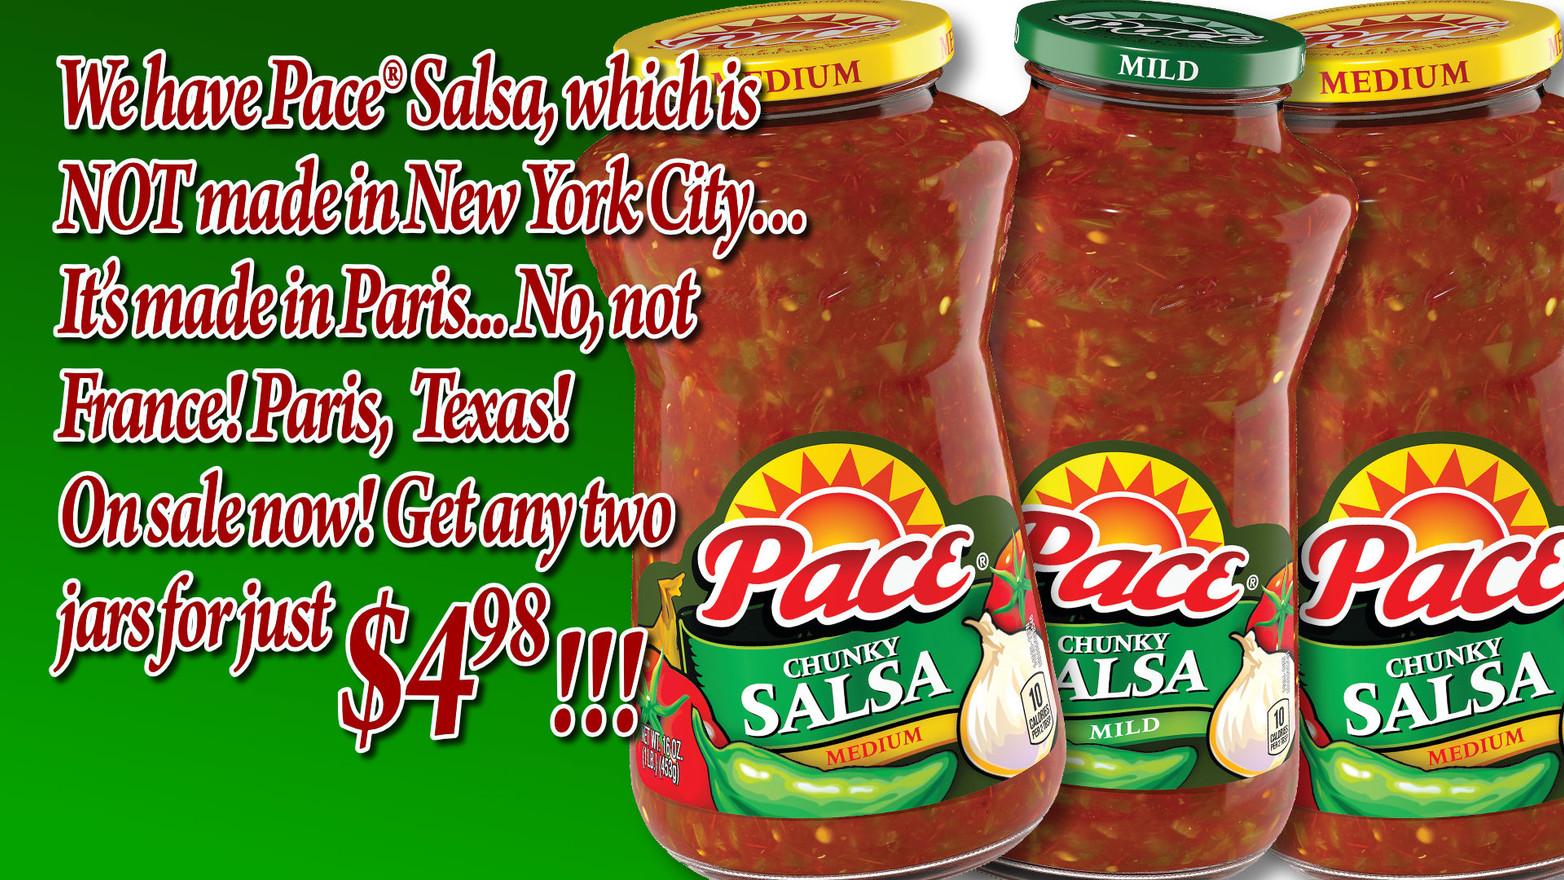 pace salsa.jpg